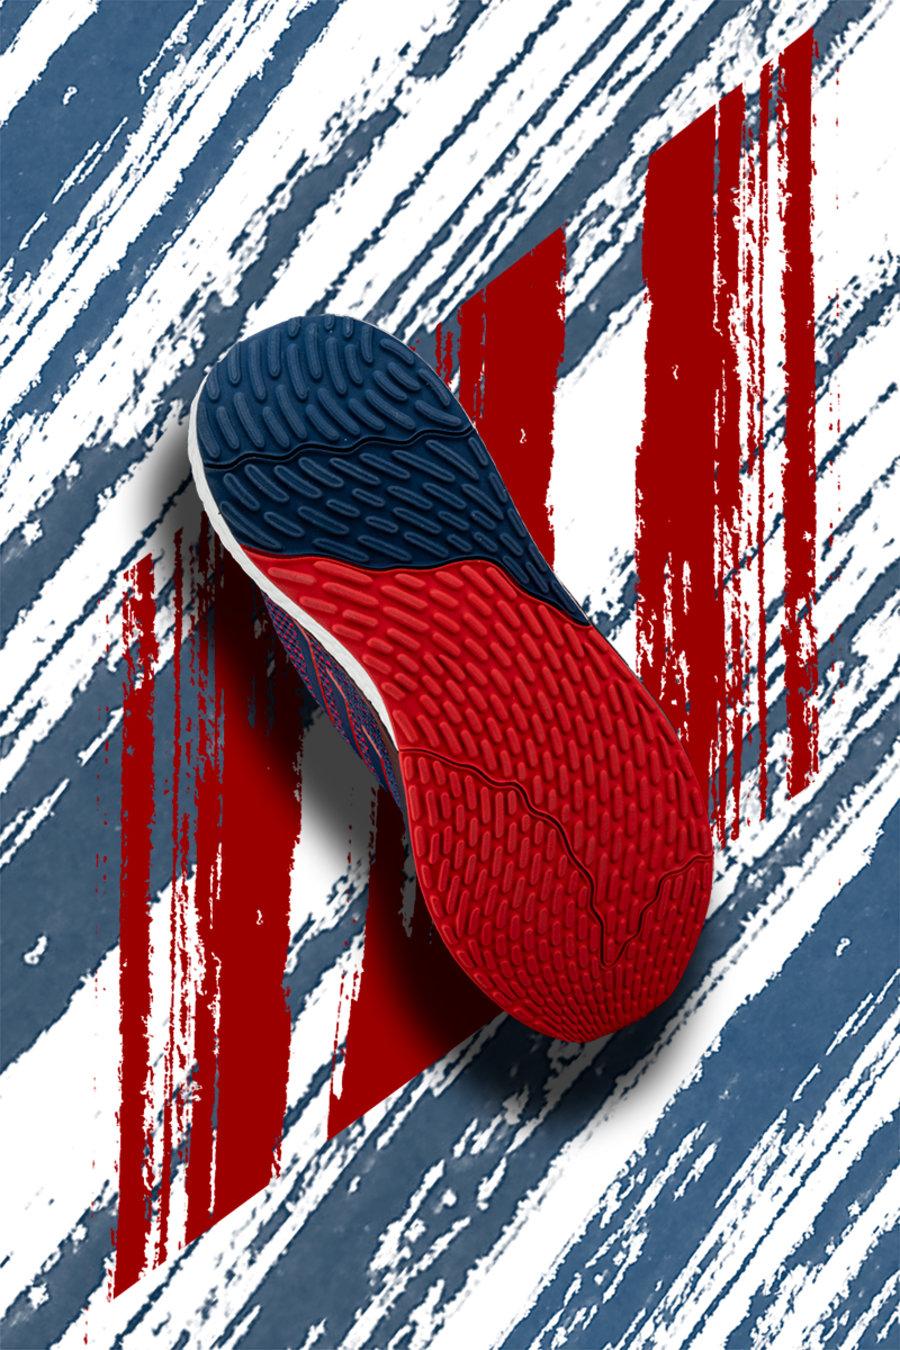 adidas,Alpha LAVA  刚刚突袭!4 厘米超厚 Boost 不讲武德!这才是梦寐以求的「万能跑鞋」!